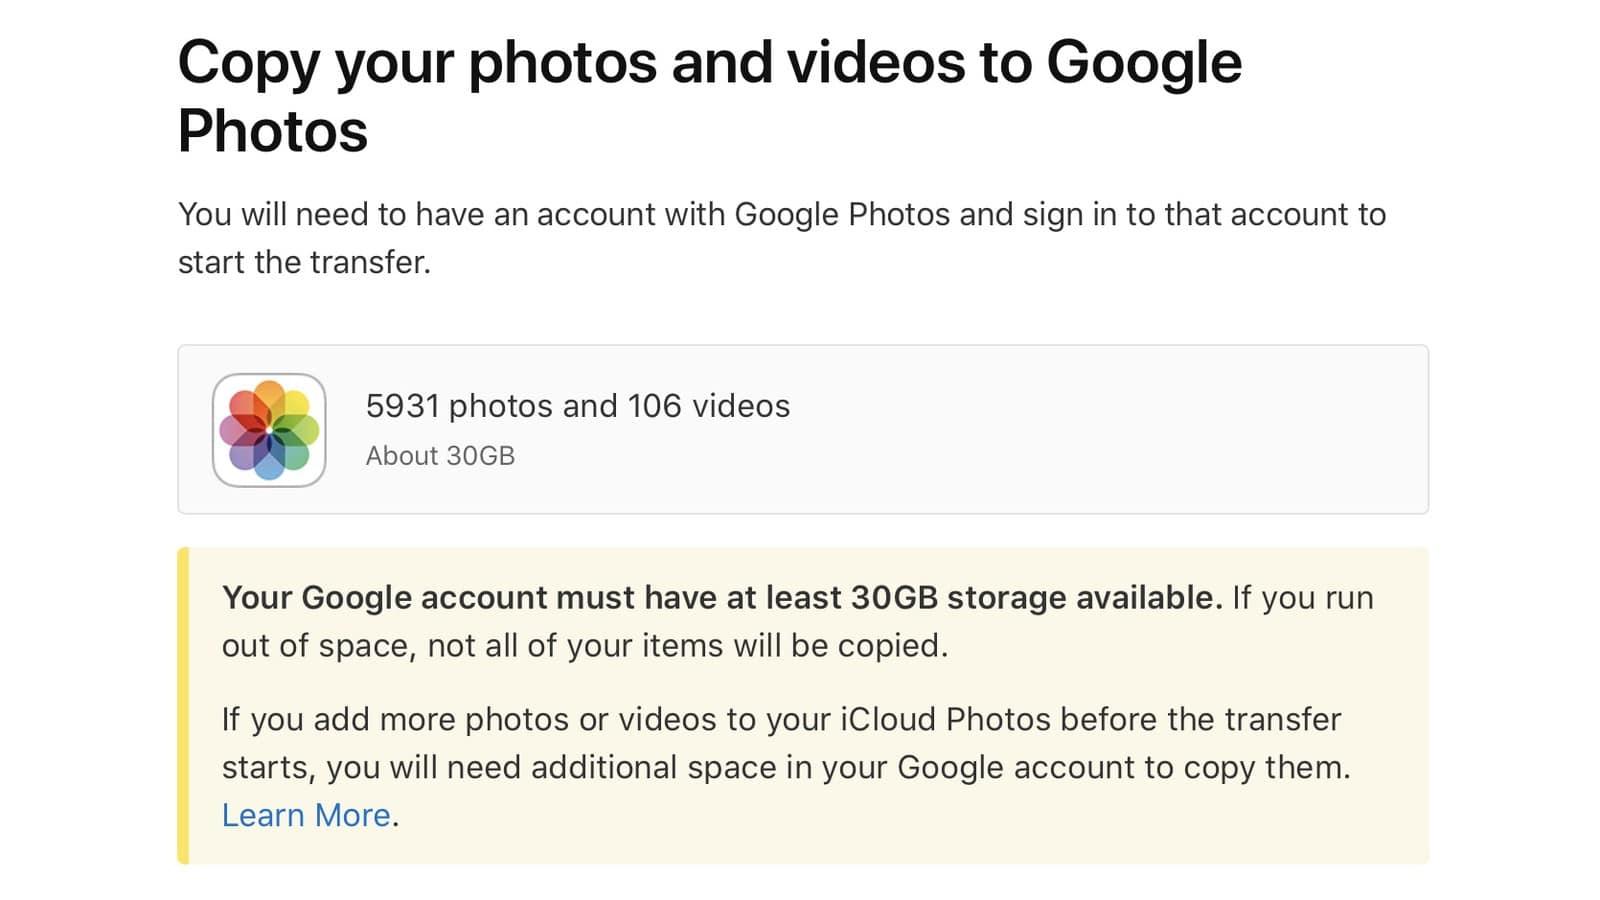 Chuyển iCloud qua Google Photos